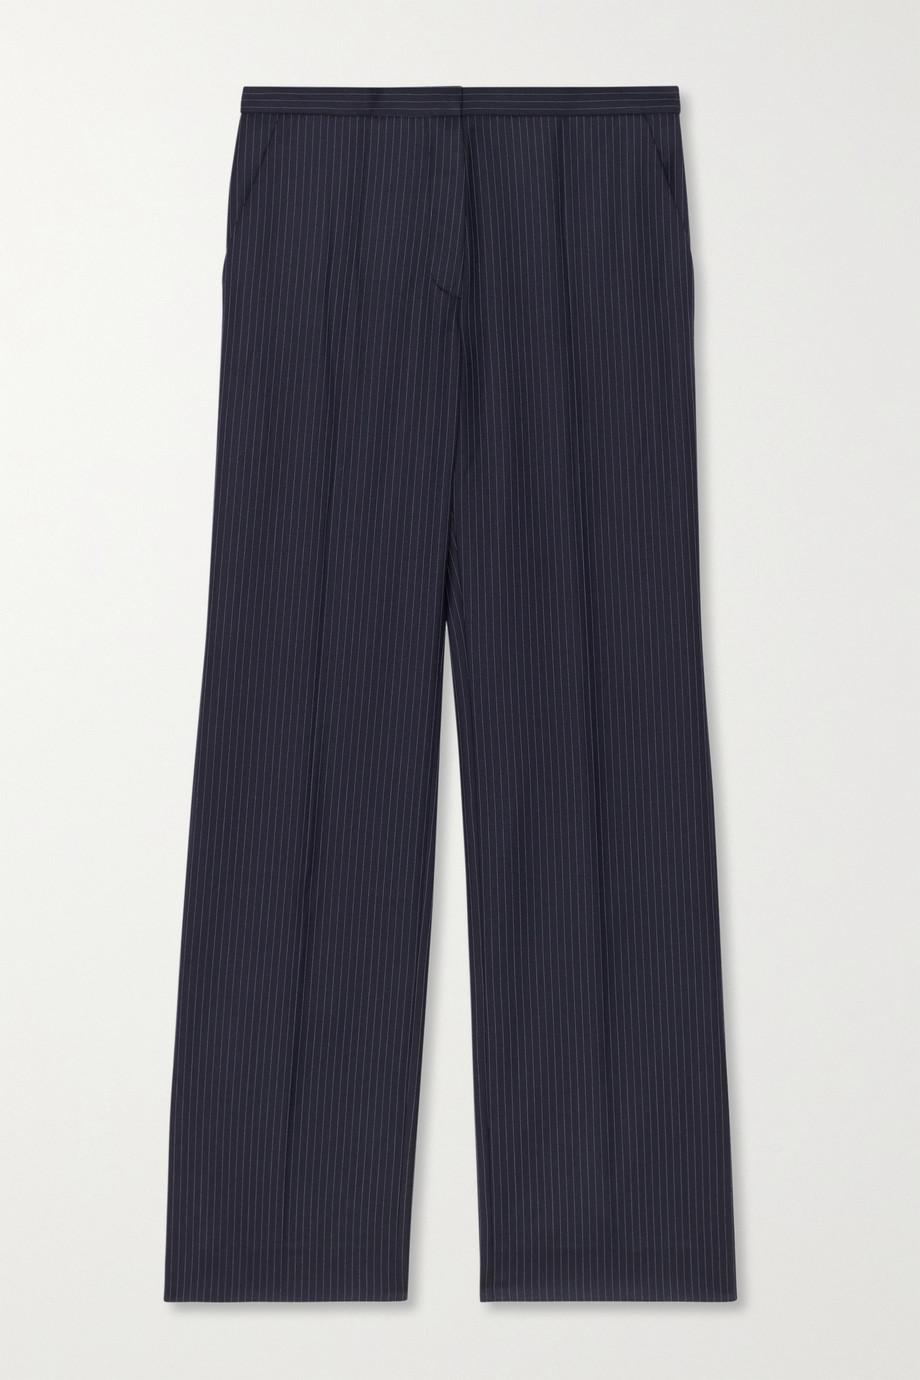 Nina Ricci Cropped pinstriped wool straight-leg pants